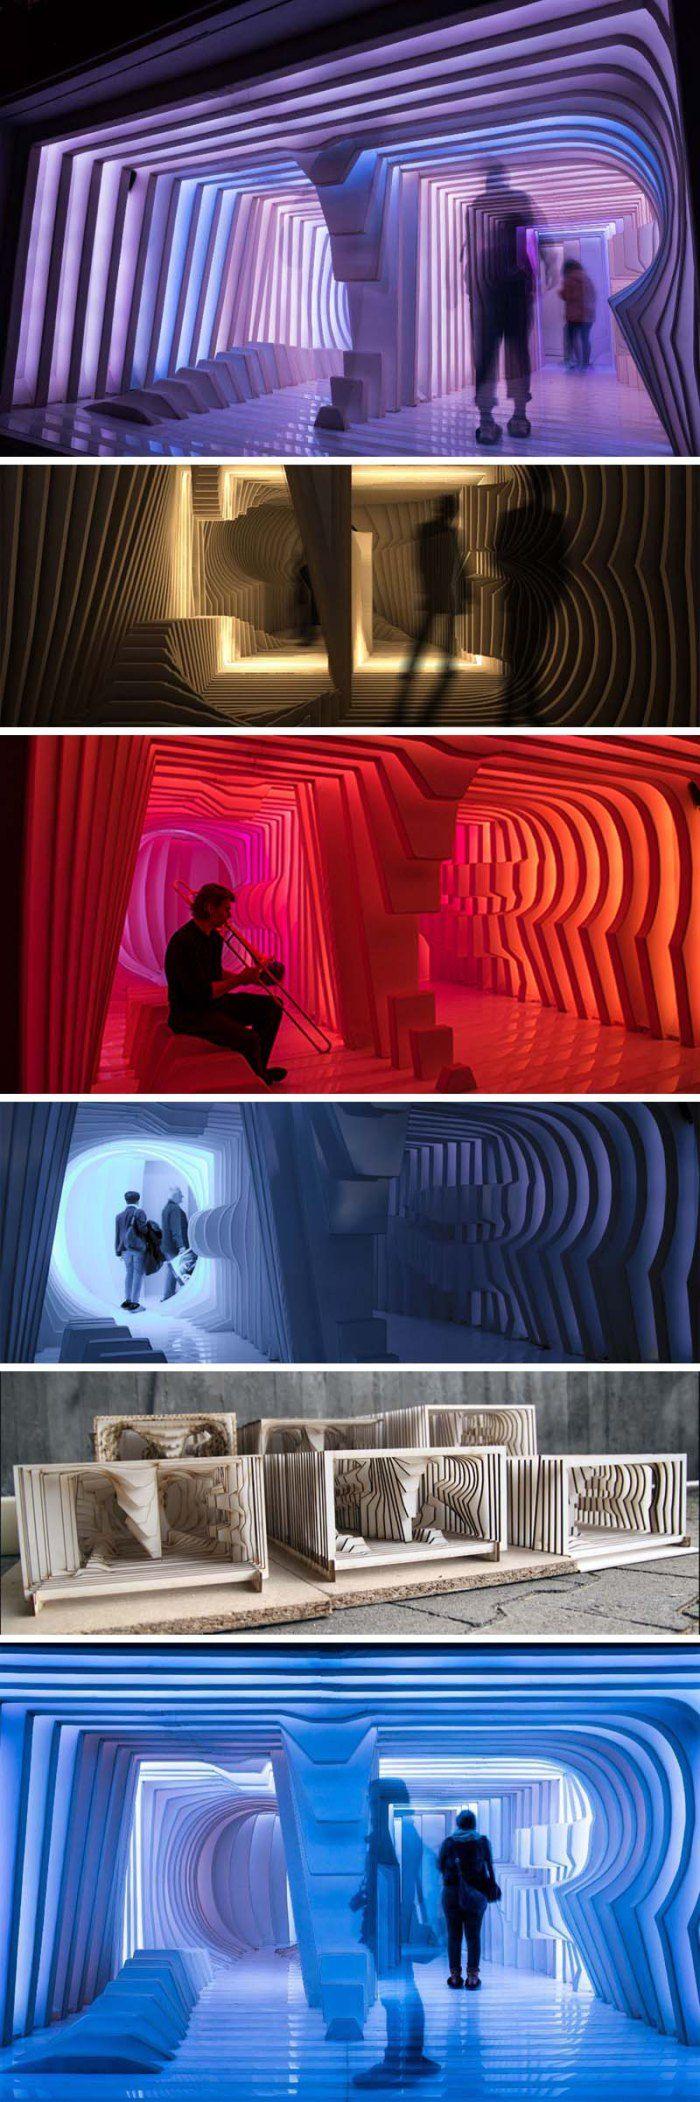 Cornea Ti, Luminale 2014, FH Mainz, Light, sound and type installation, cool art